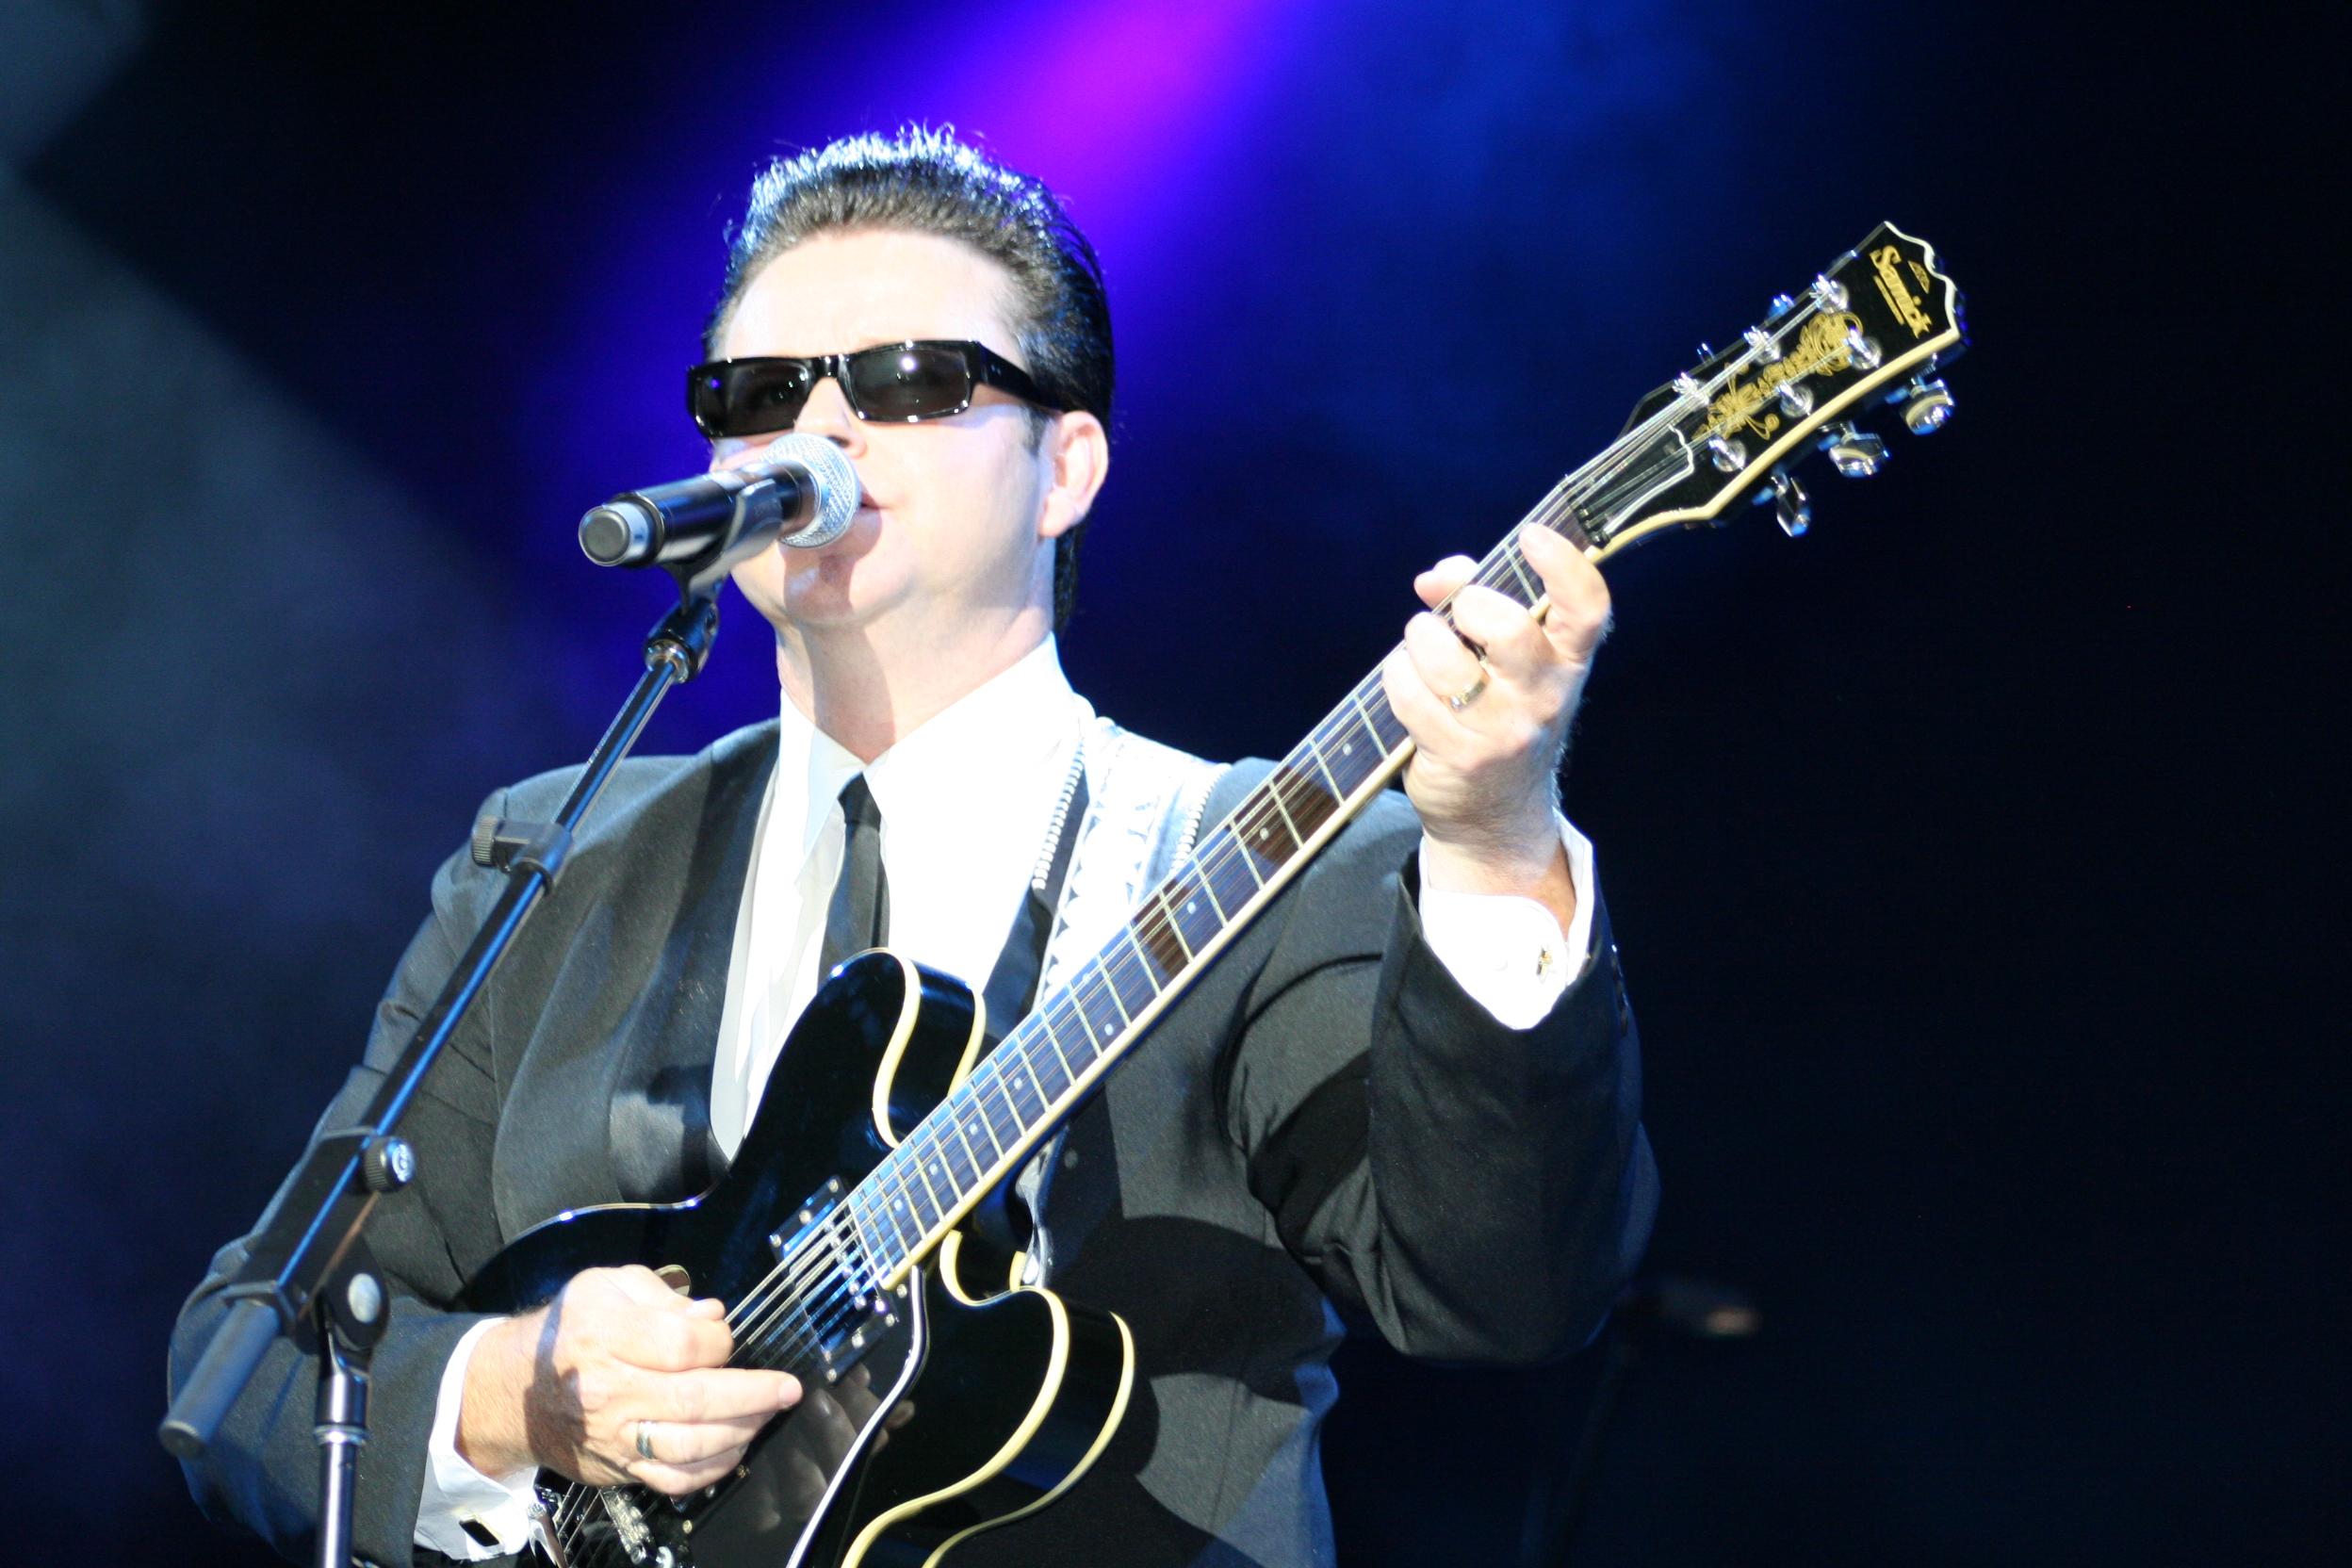 Dean Bourne – Australia's Roy Orbison Tribute Artist